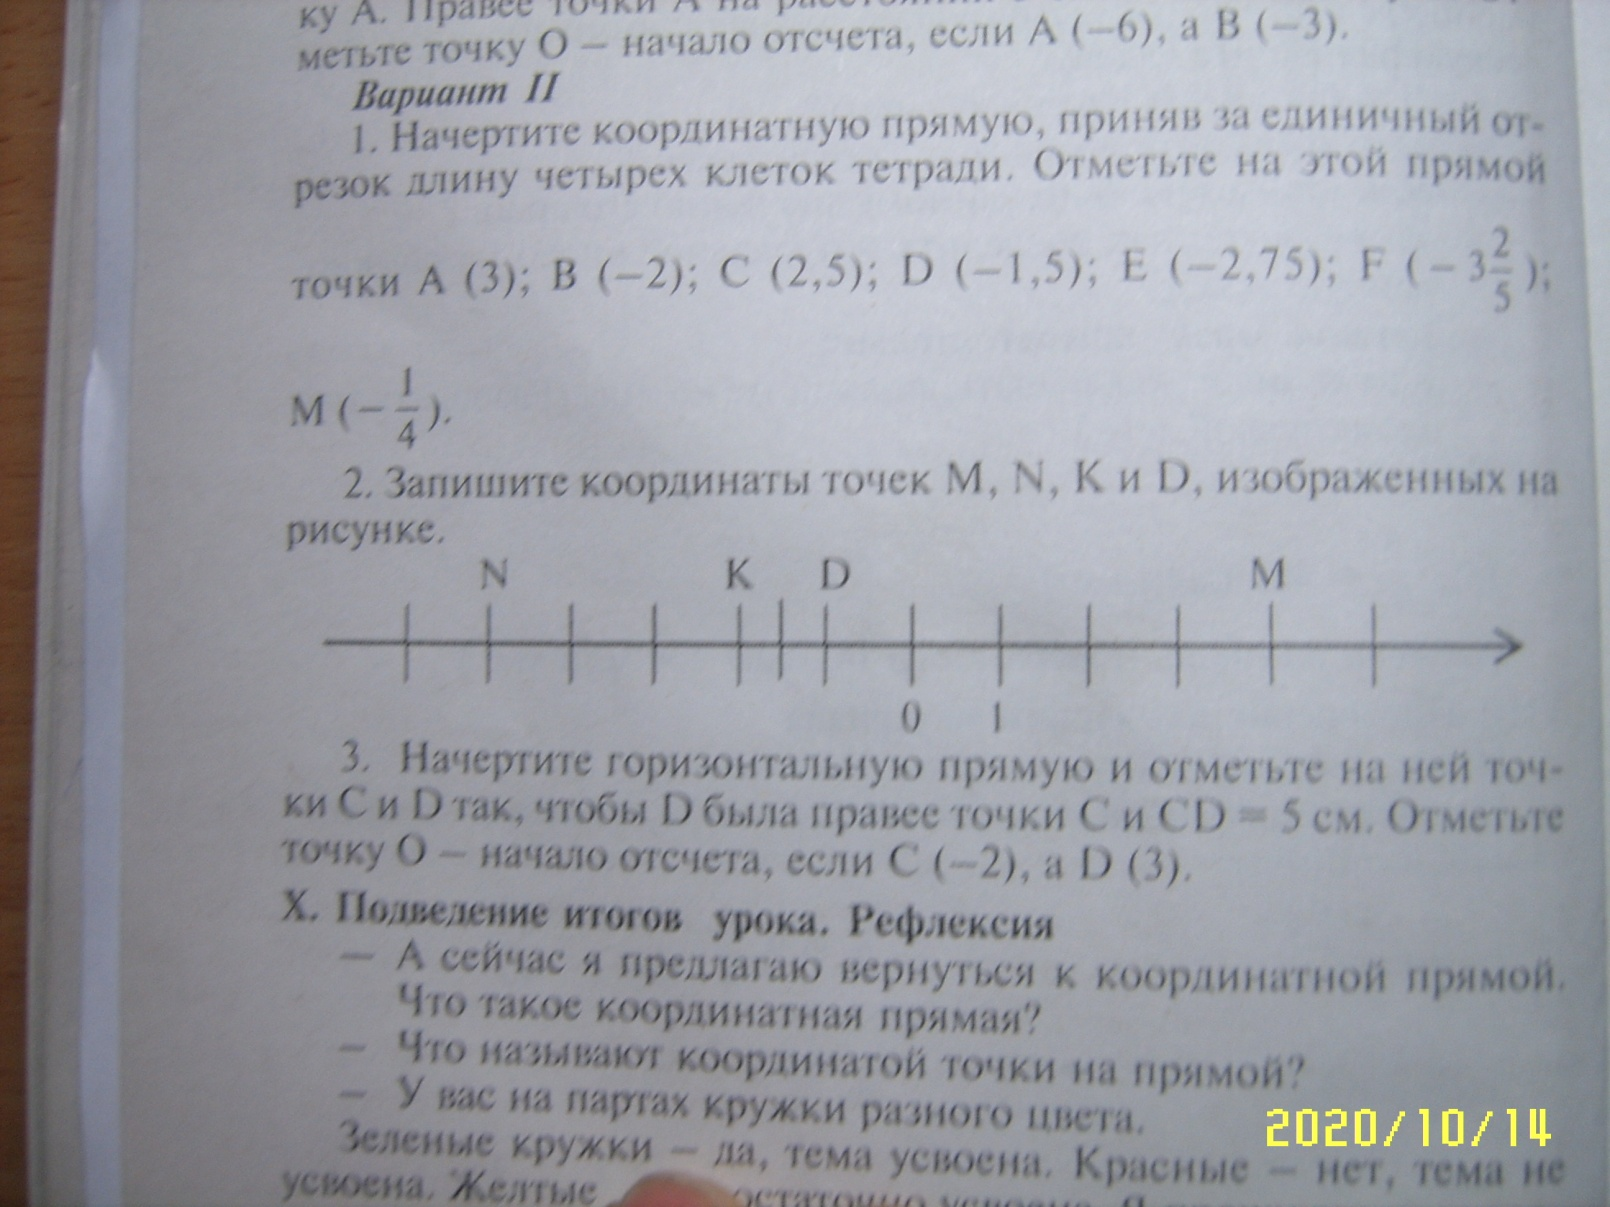 G:\DCIM\101SSCAM\SUC50006.JPG